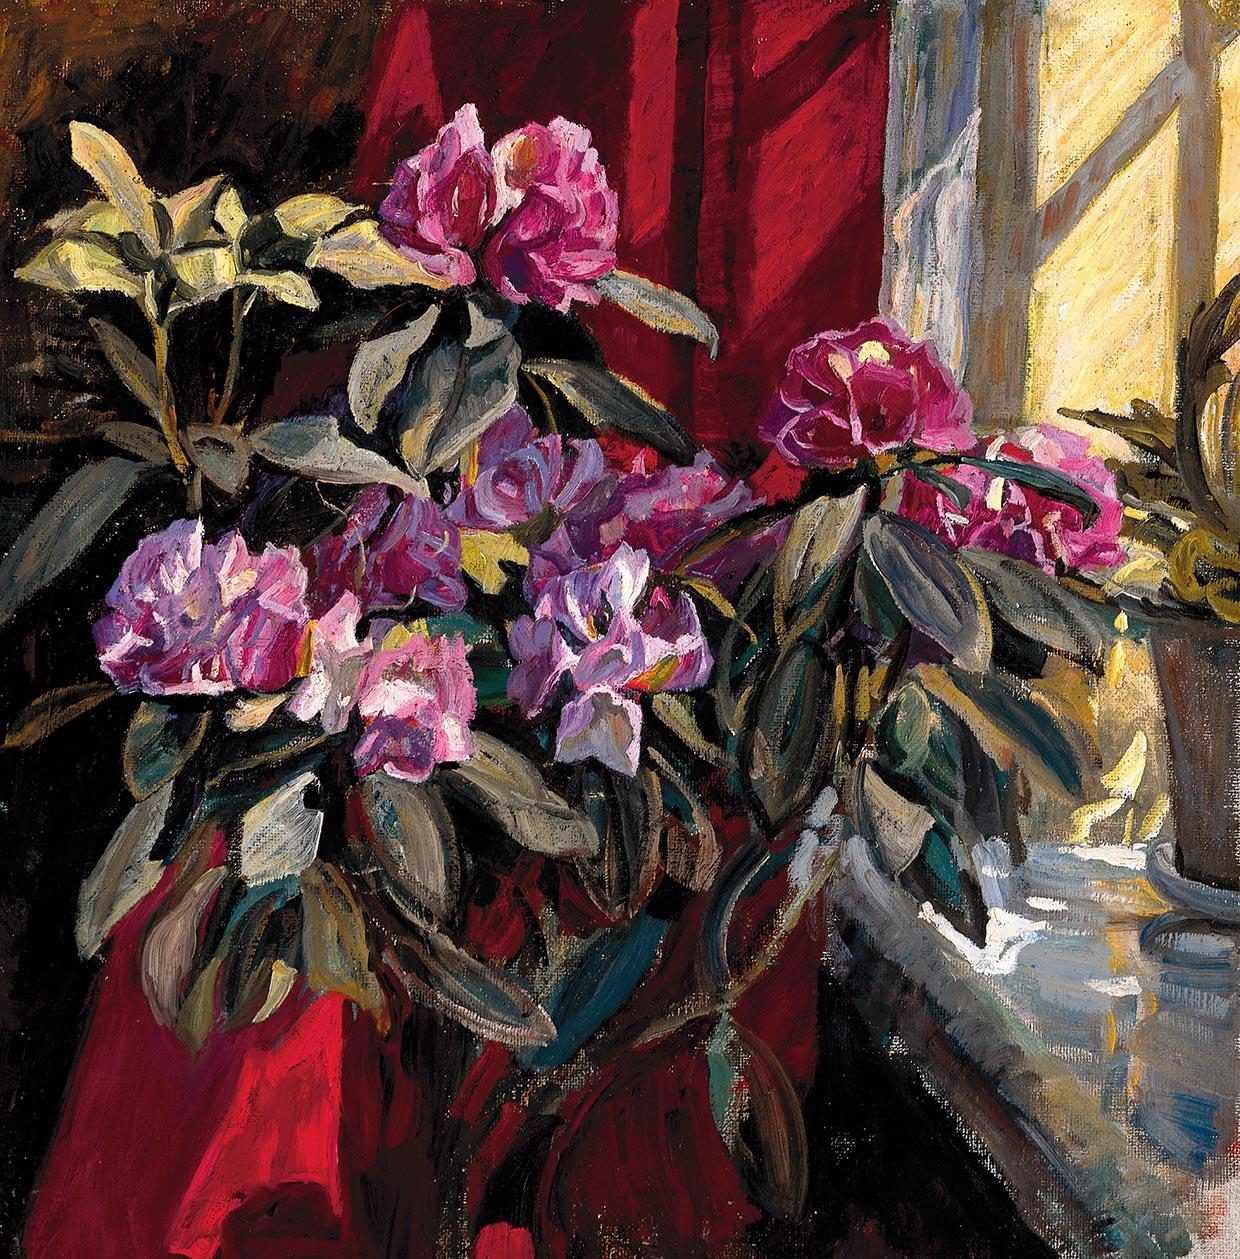 Alhed Larsen, Rhododendron, u.å. Johannes Larsen Museet. Foto: Jens Frederiksen